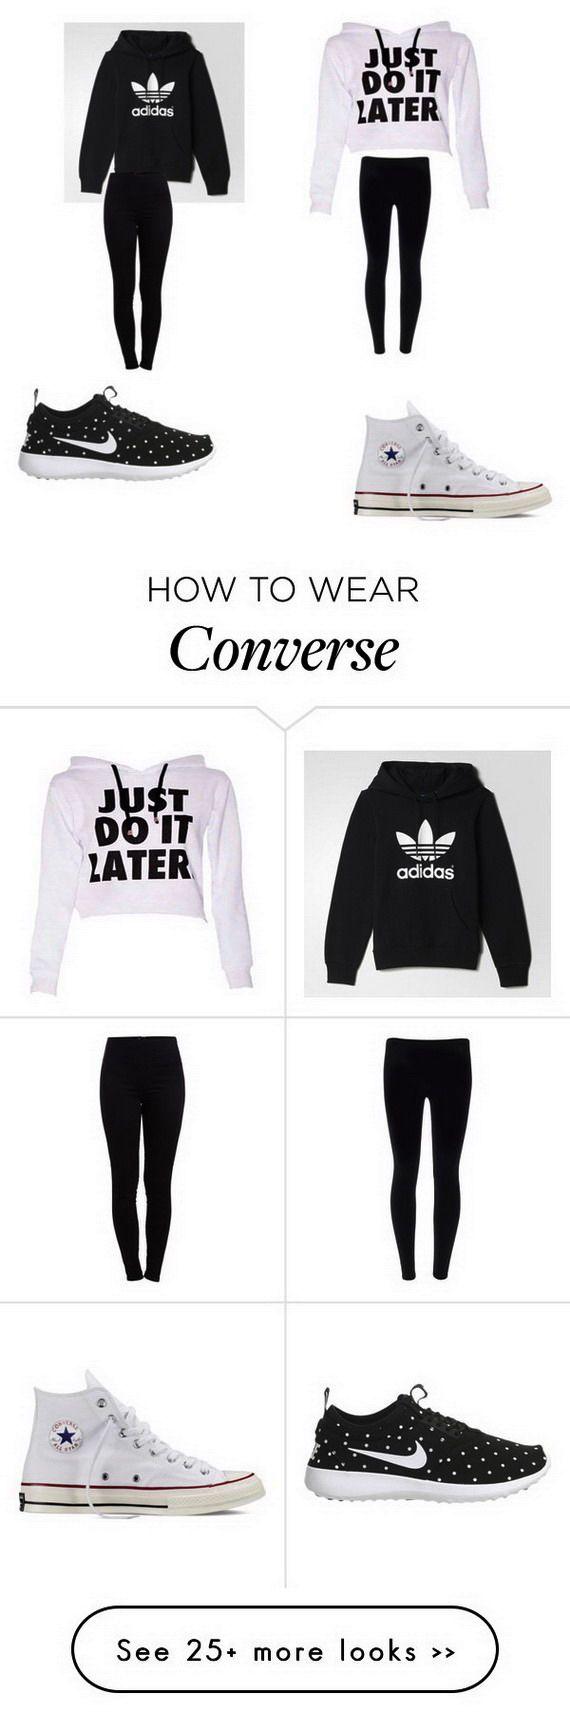 Converse + Adidas